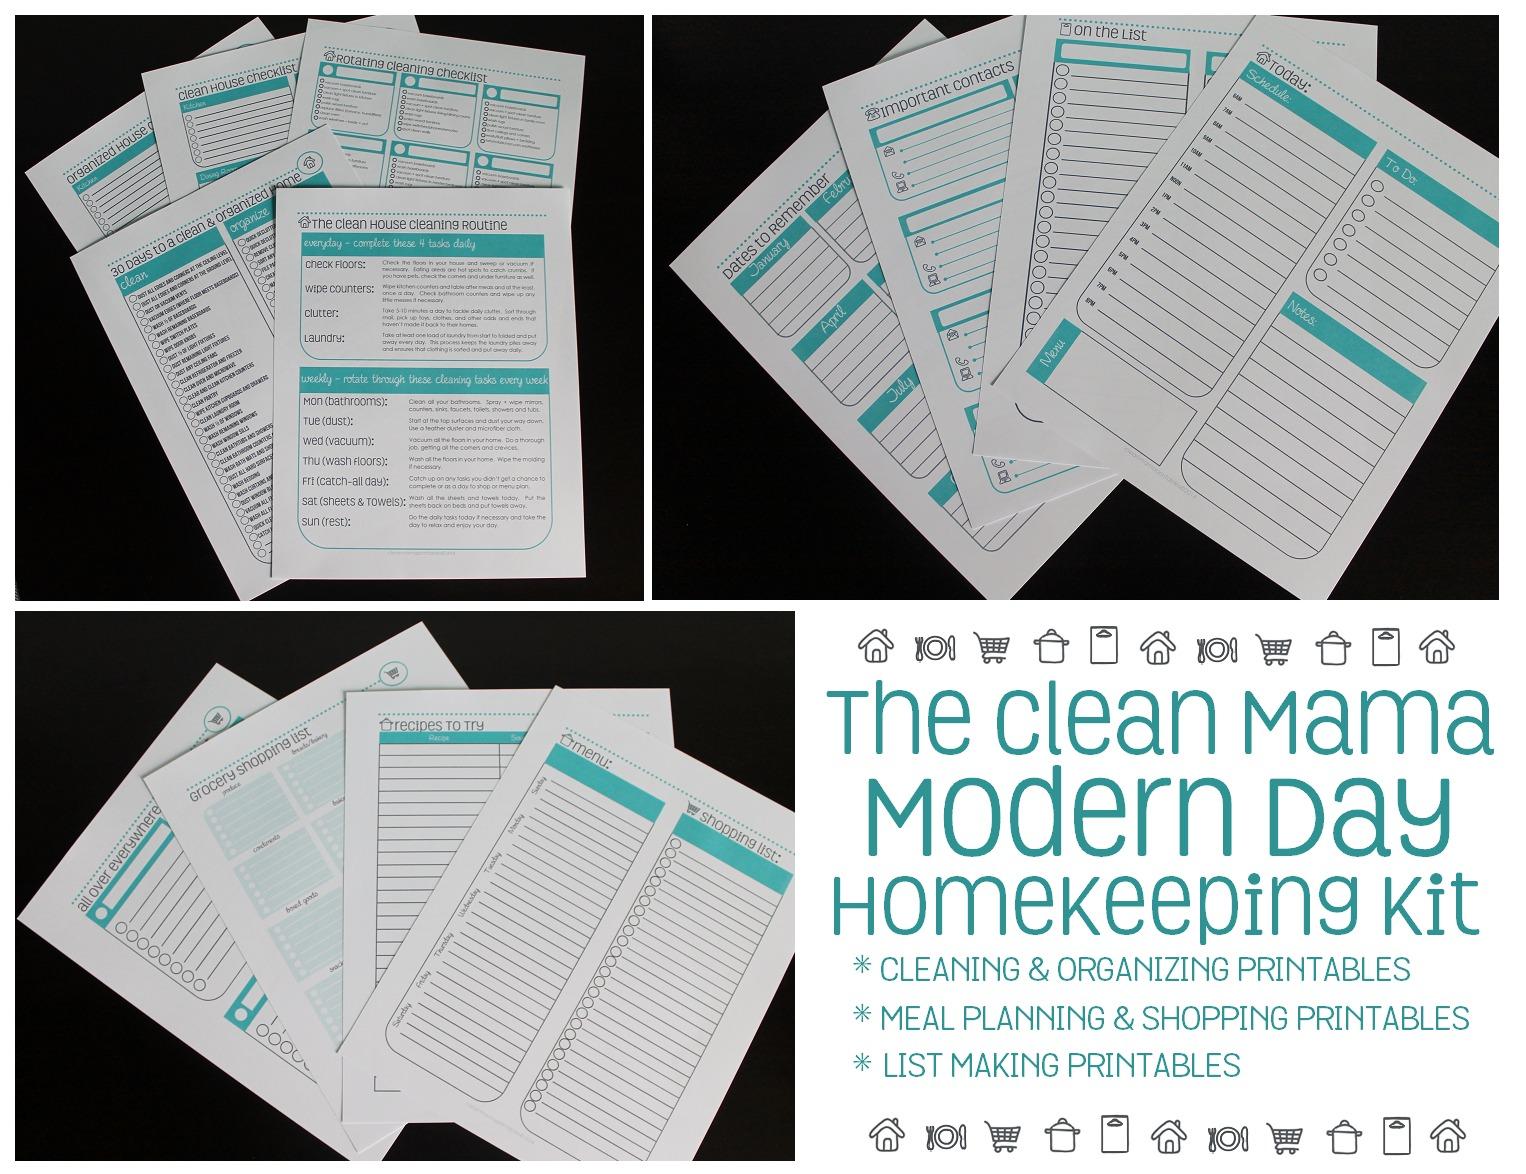 The Clean Mama Modern Day Homekeeping Kit 2 via Clean Mama